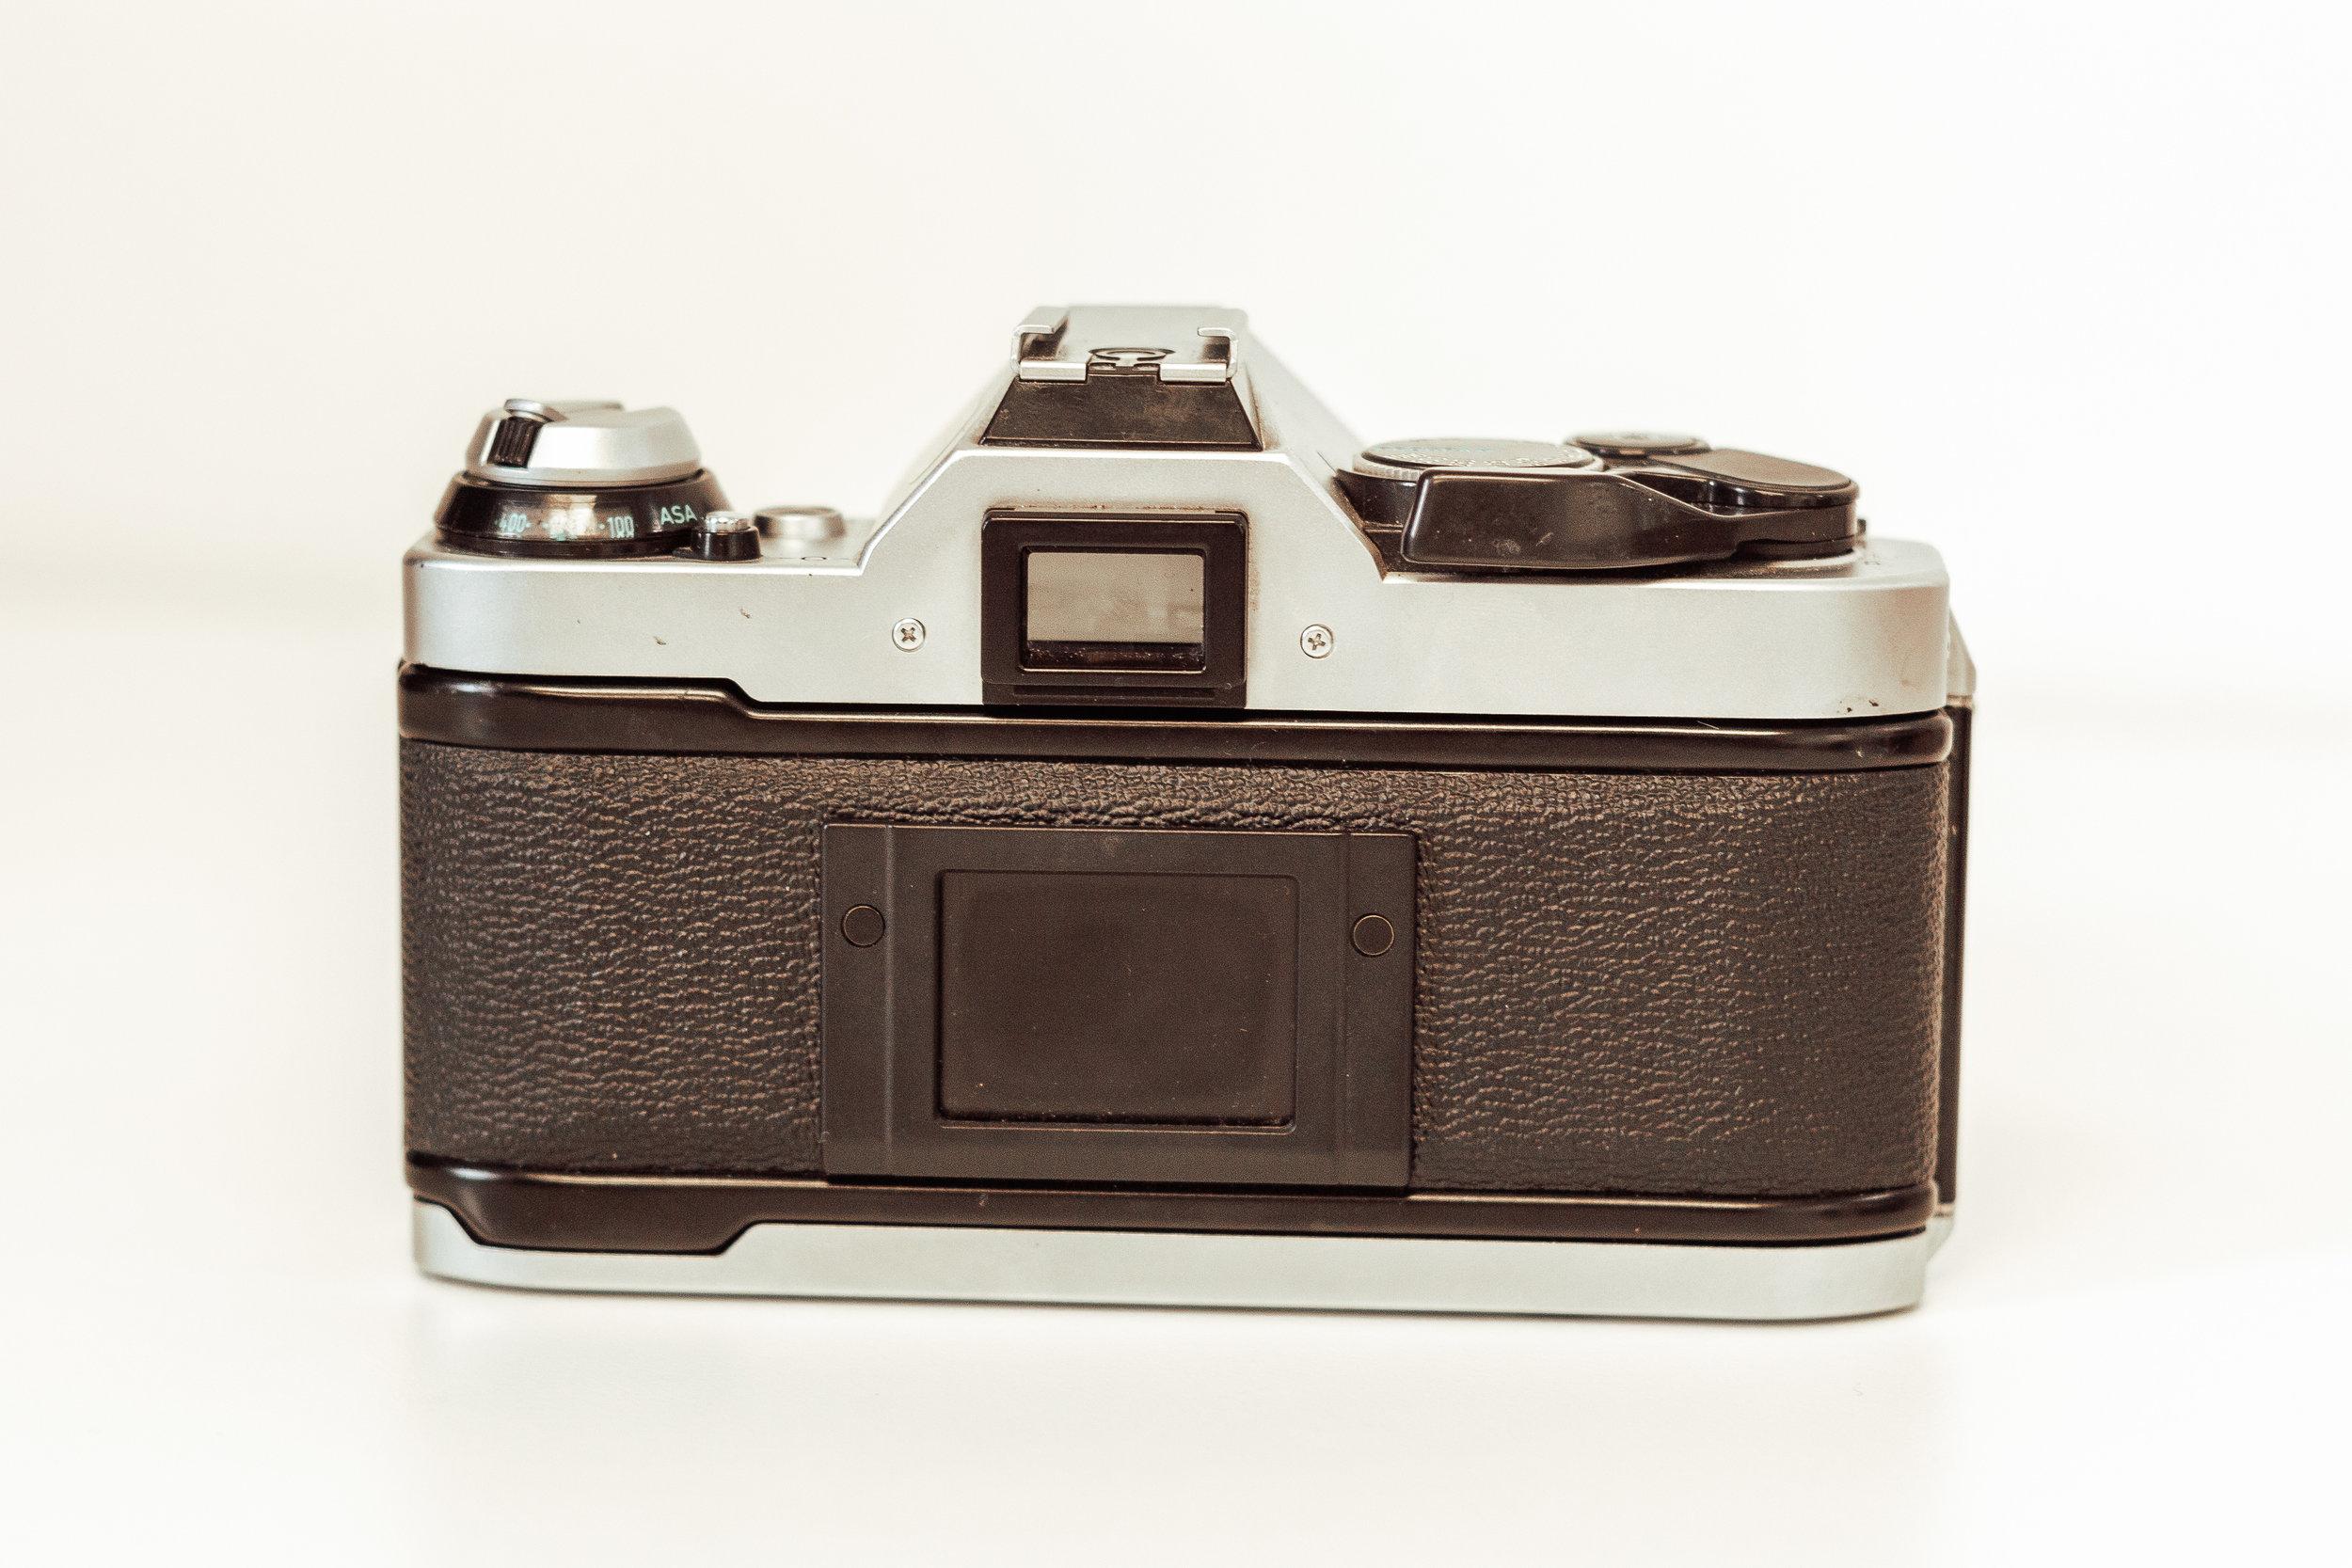 back of Canon AE-1 Program